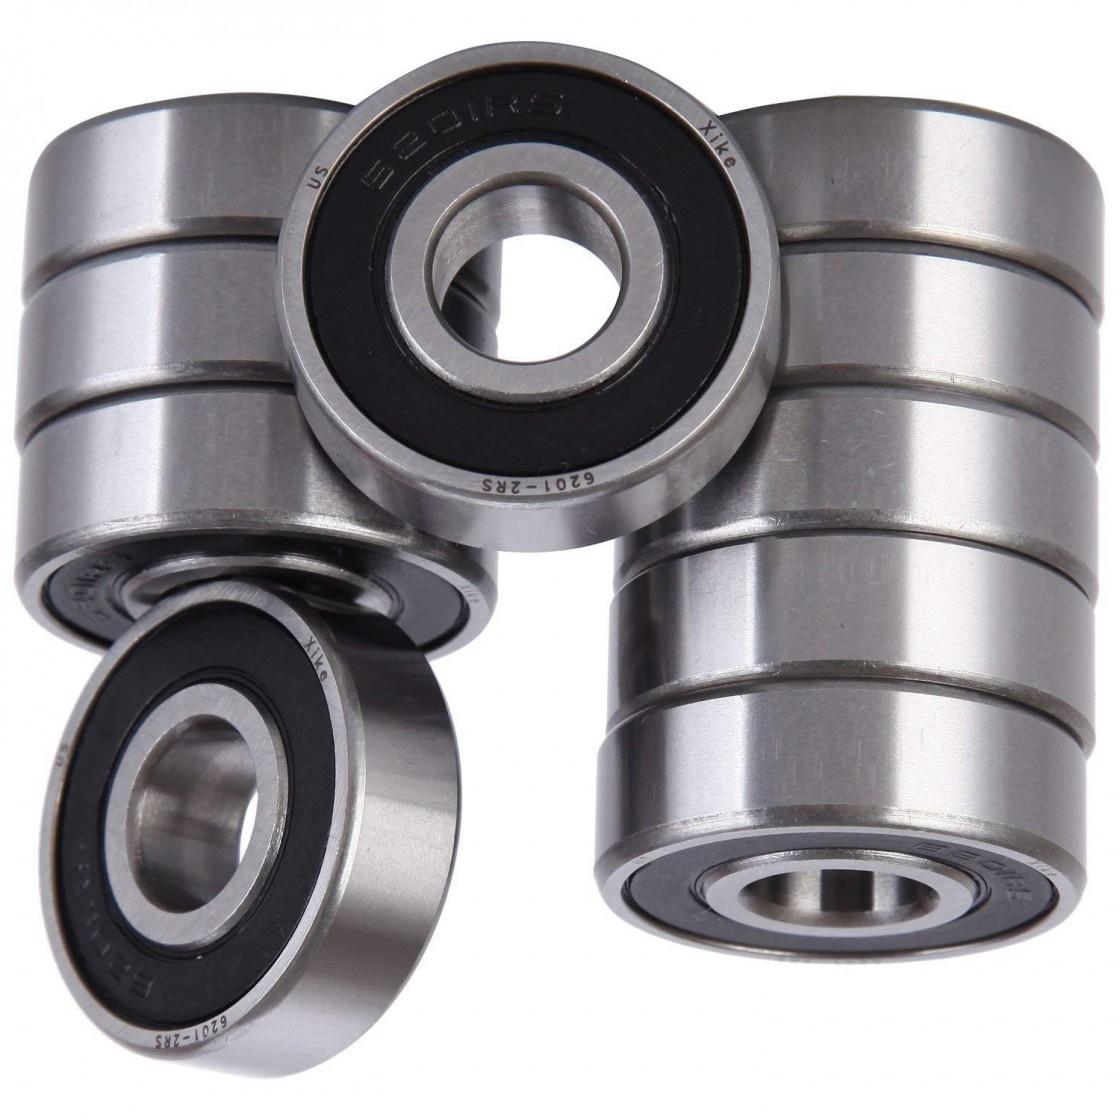 SKF Miniature Deep Groove Ball Bearing 688 688zz 688 2RS1 C3 SKF Deep Groove Ball Bearings